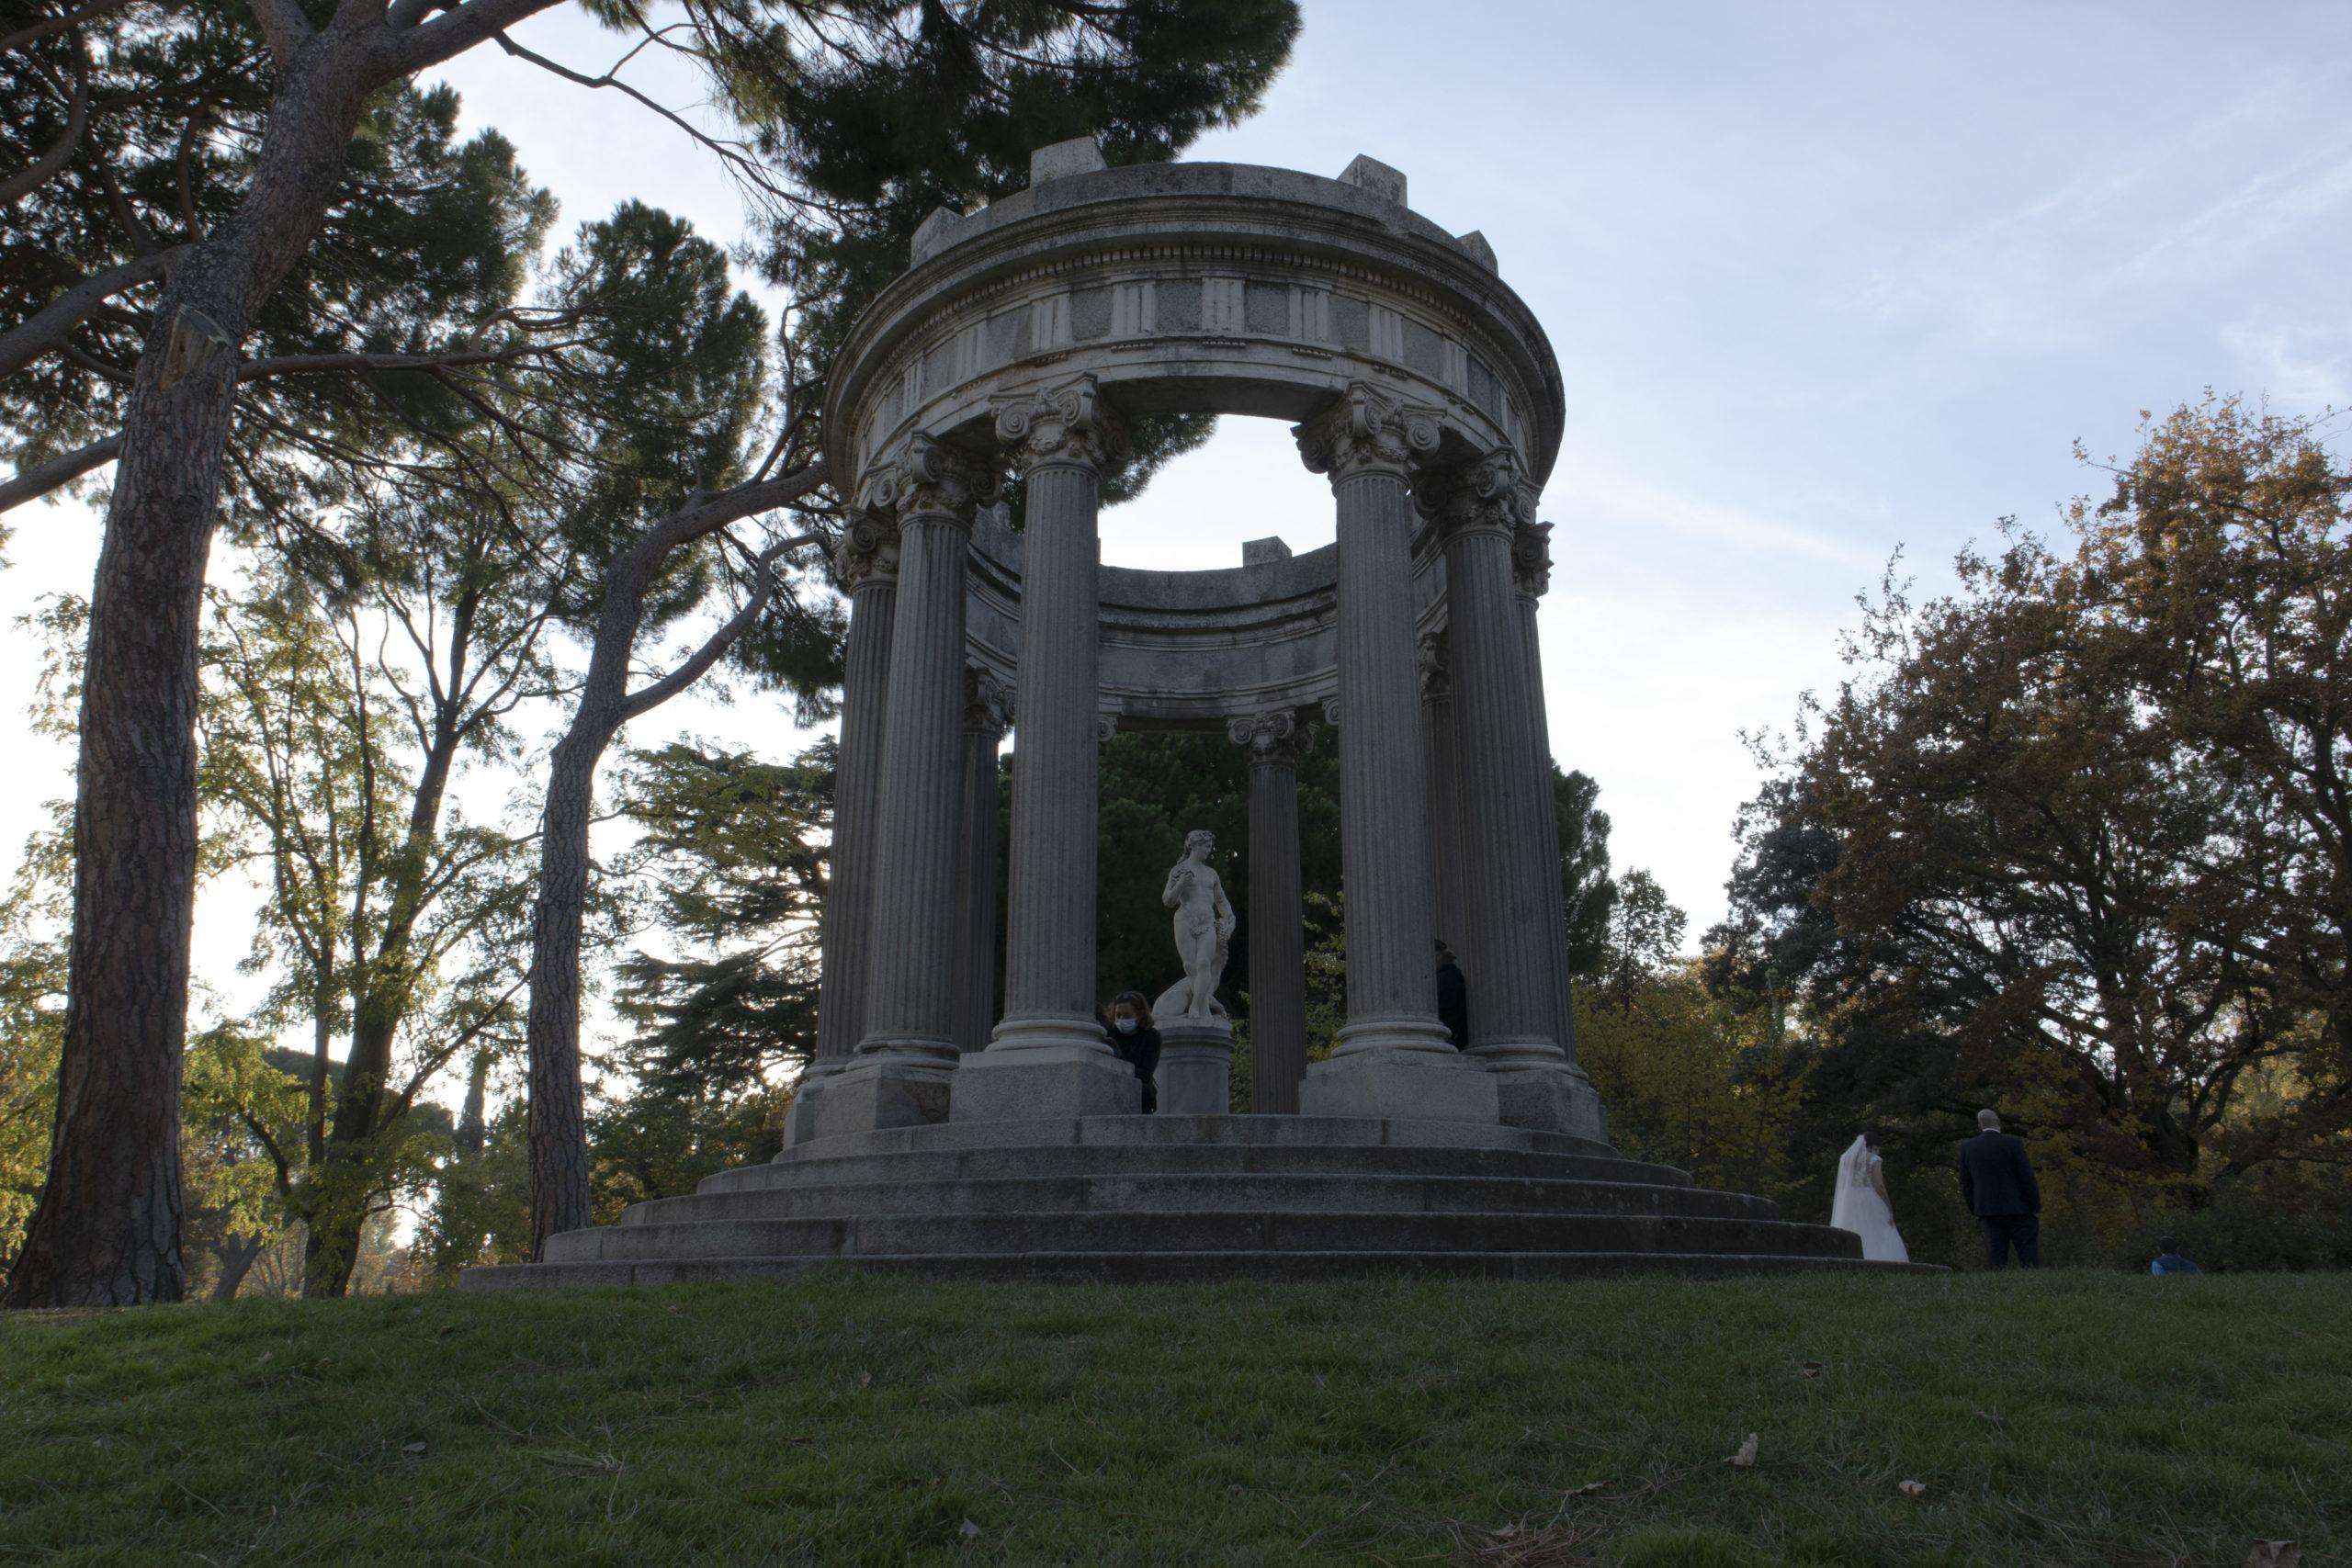 templo-baco-parque-capricho